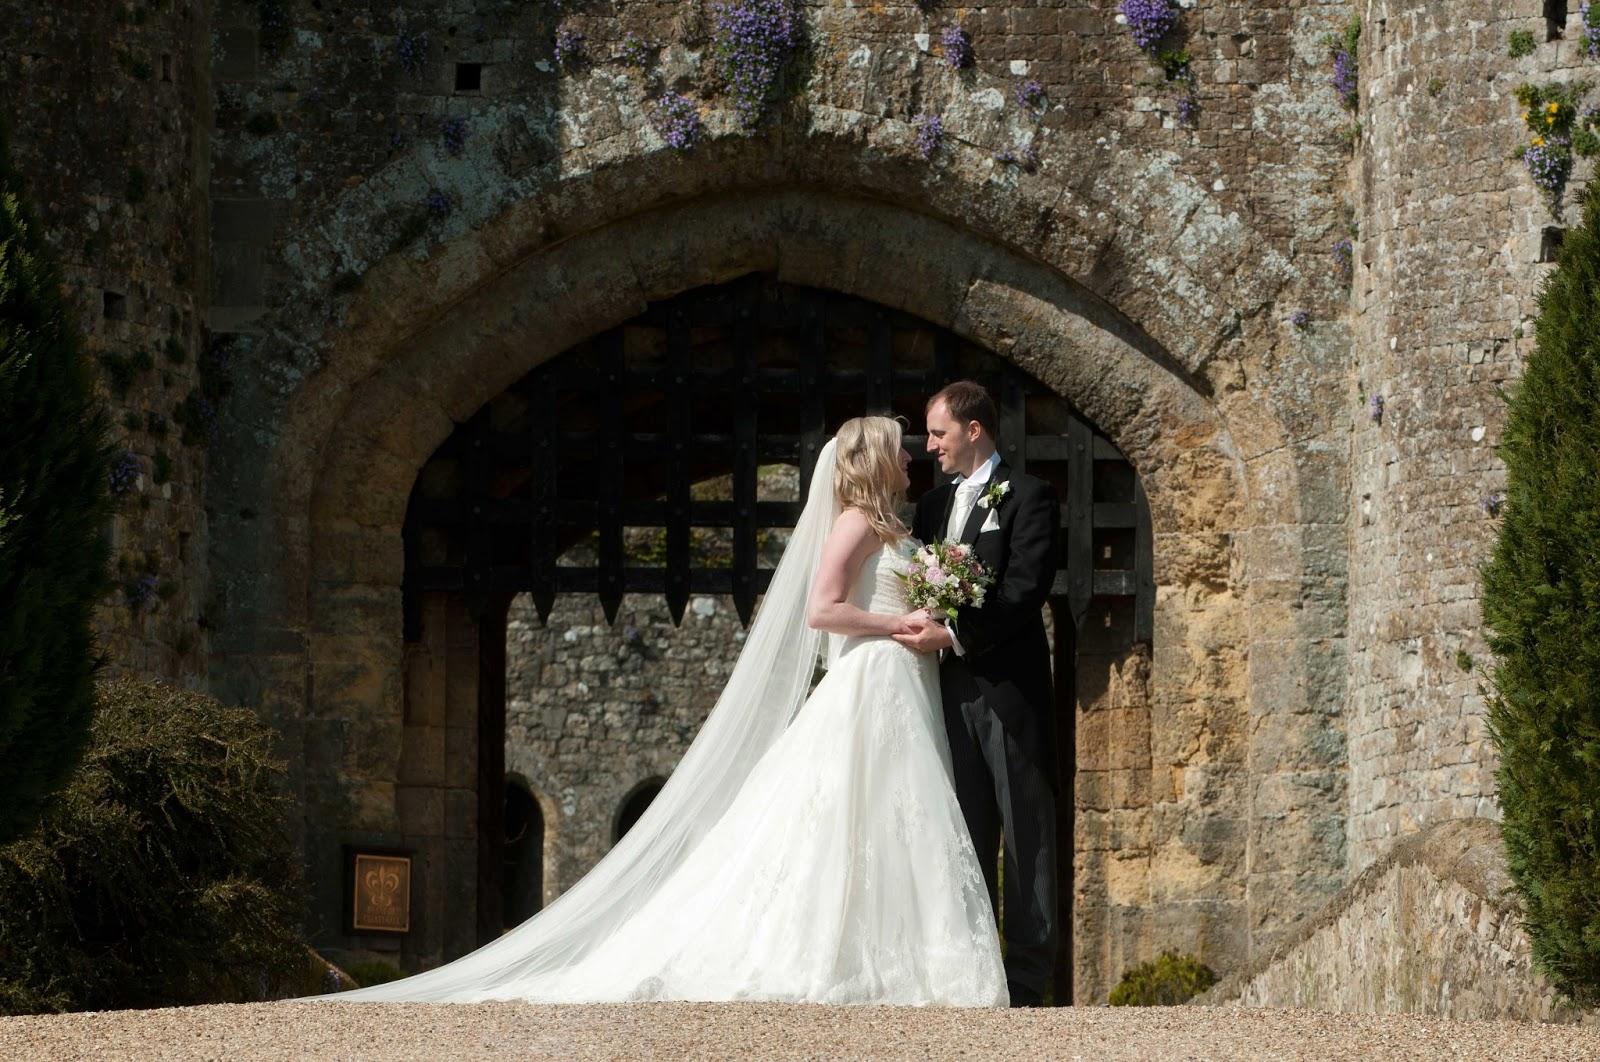 Castle post wedding